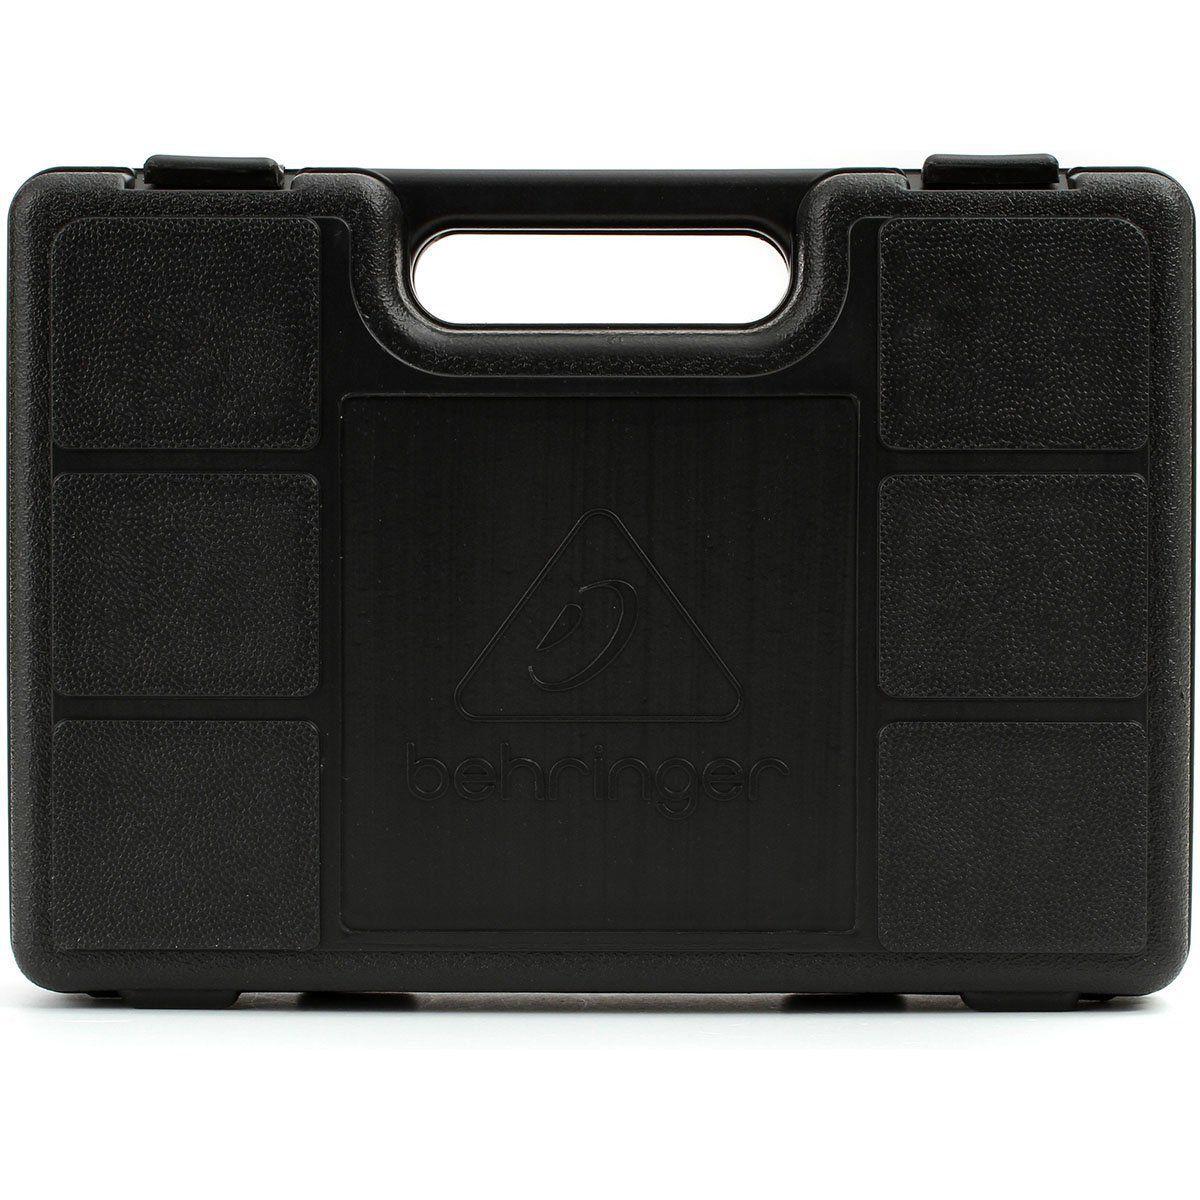 Kit 3 Microfone Behringer Xm1800s + Case Cachimbo